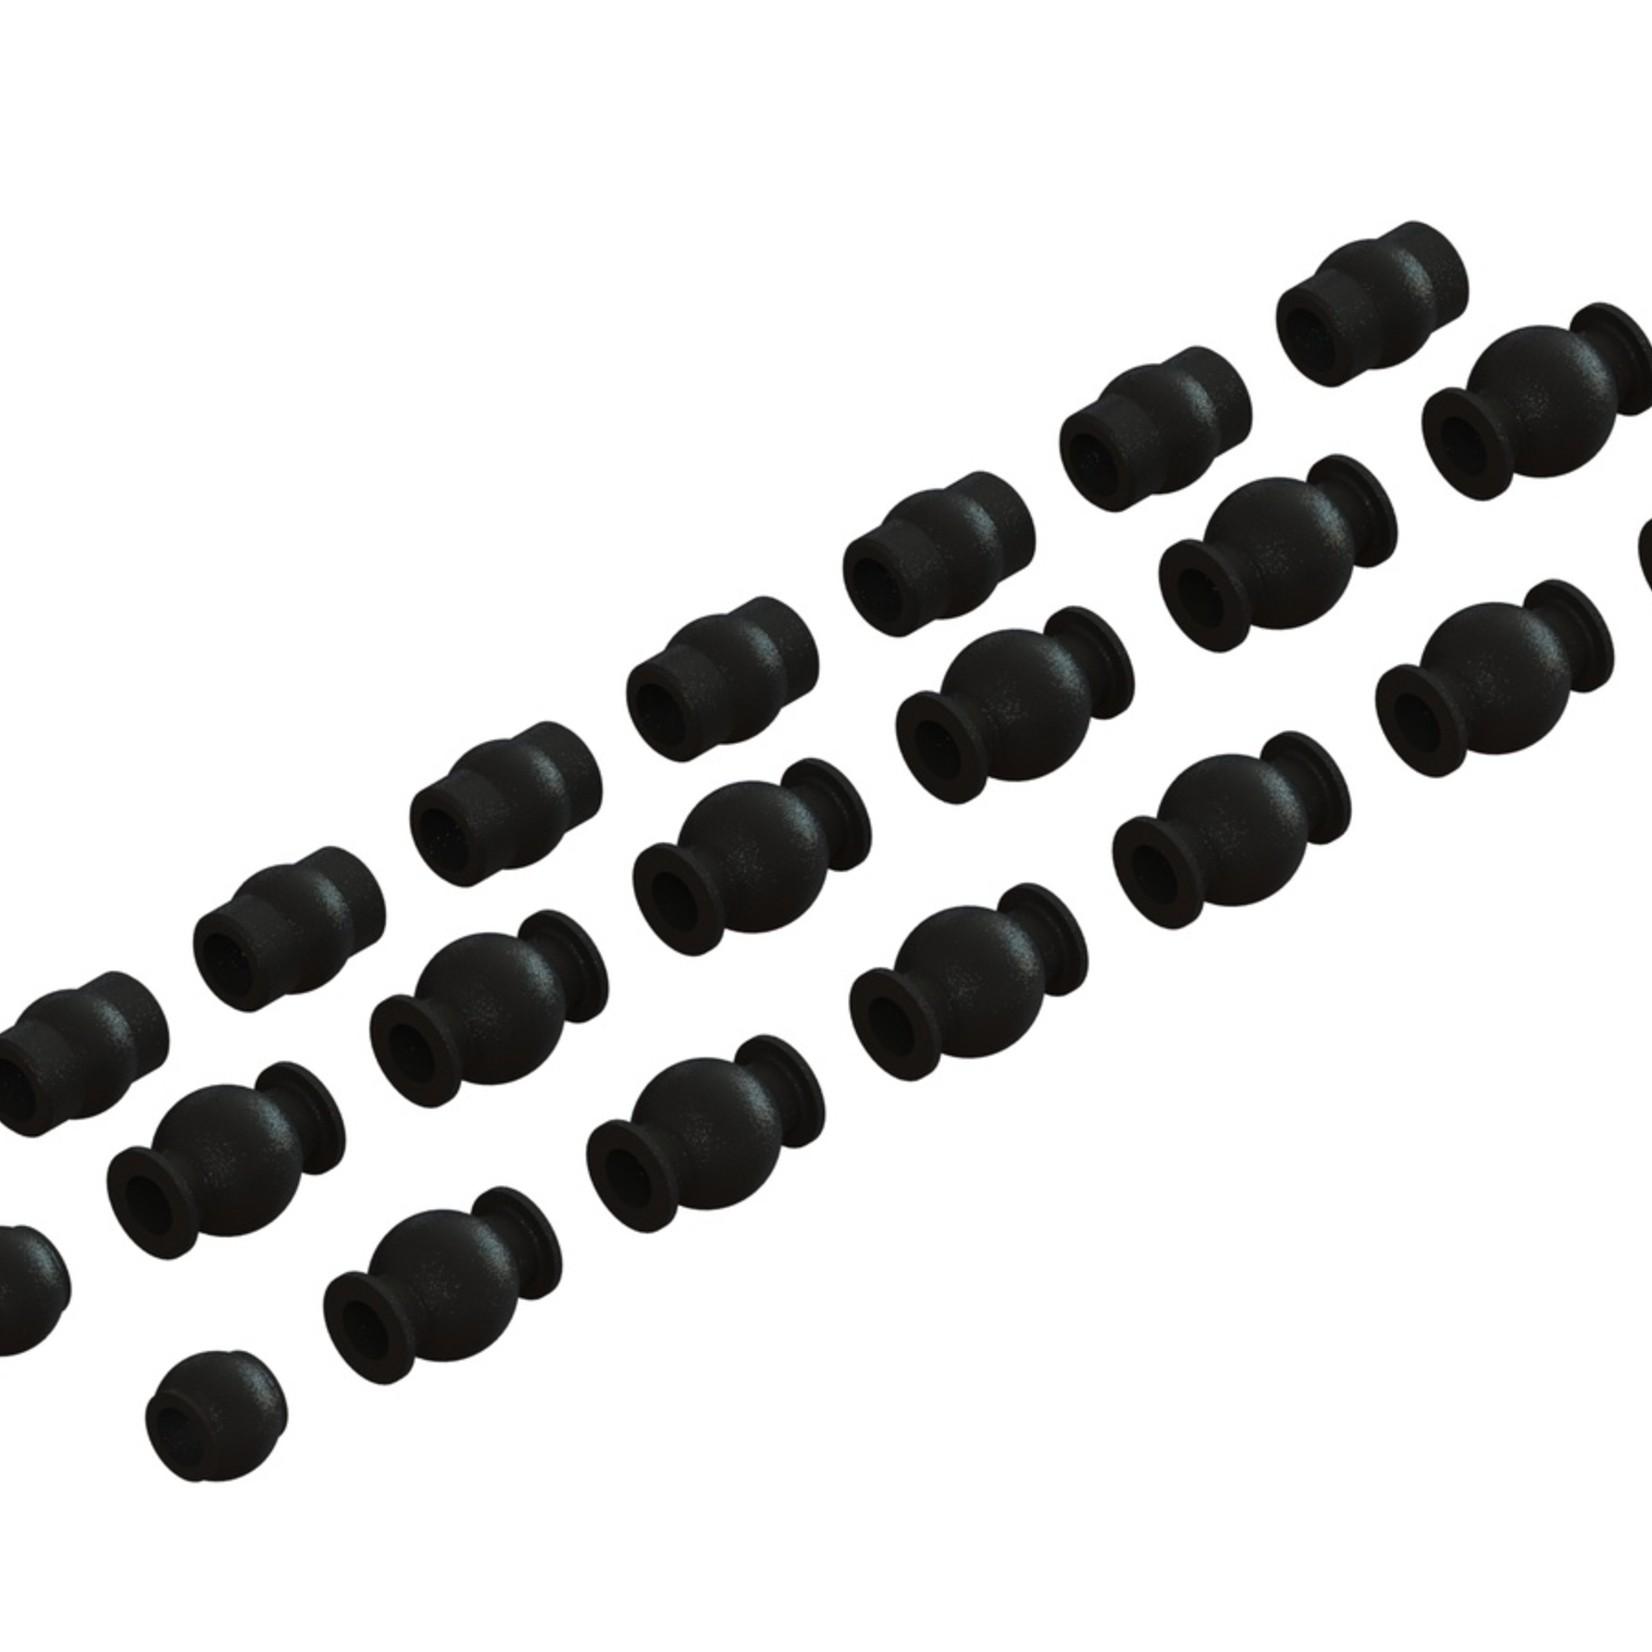 ARRMA AR330515 Arrma Composite Pivot Ball Set 4x4